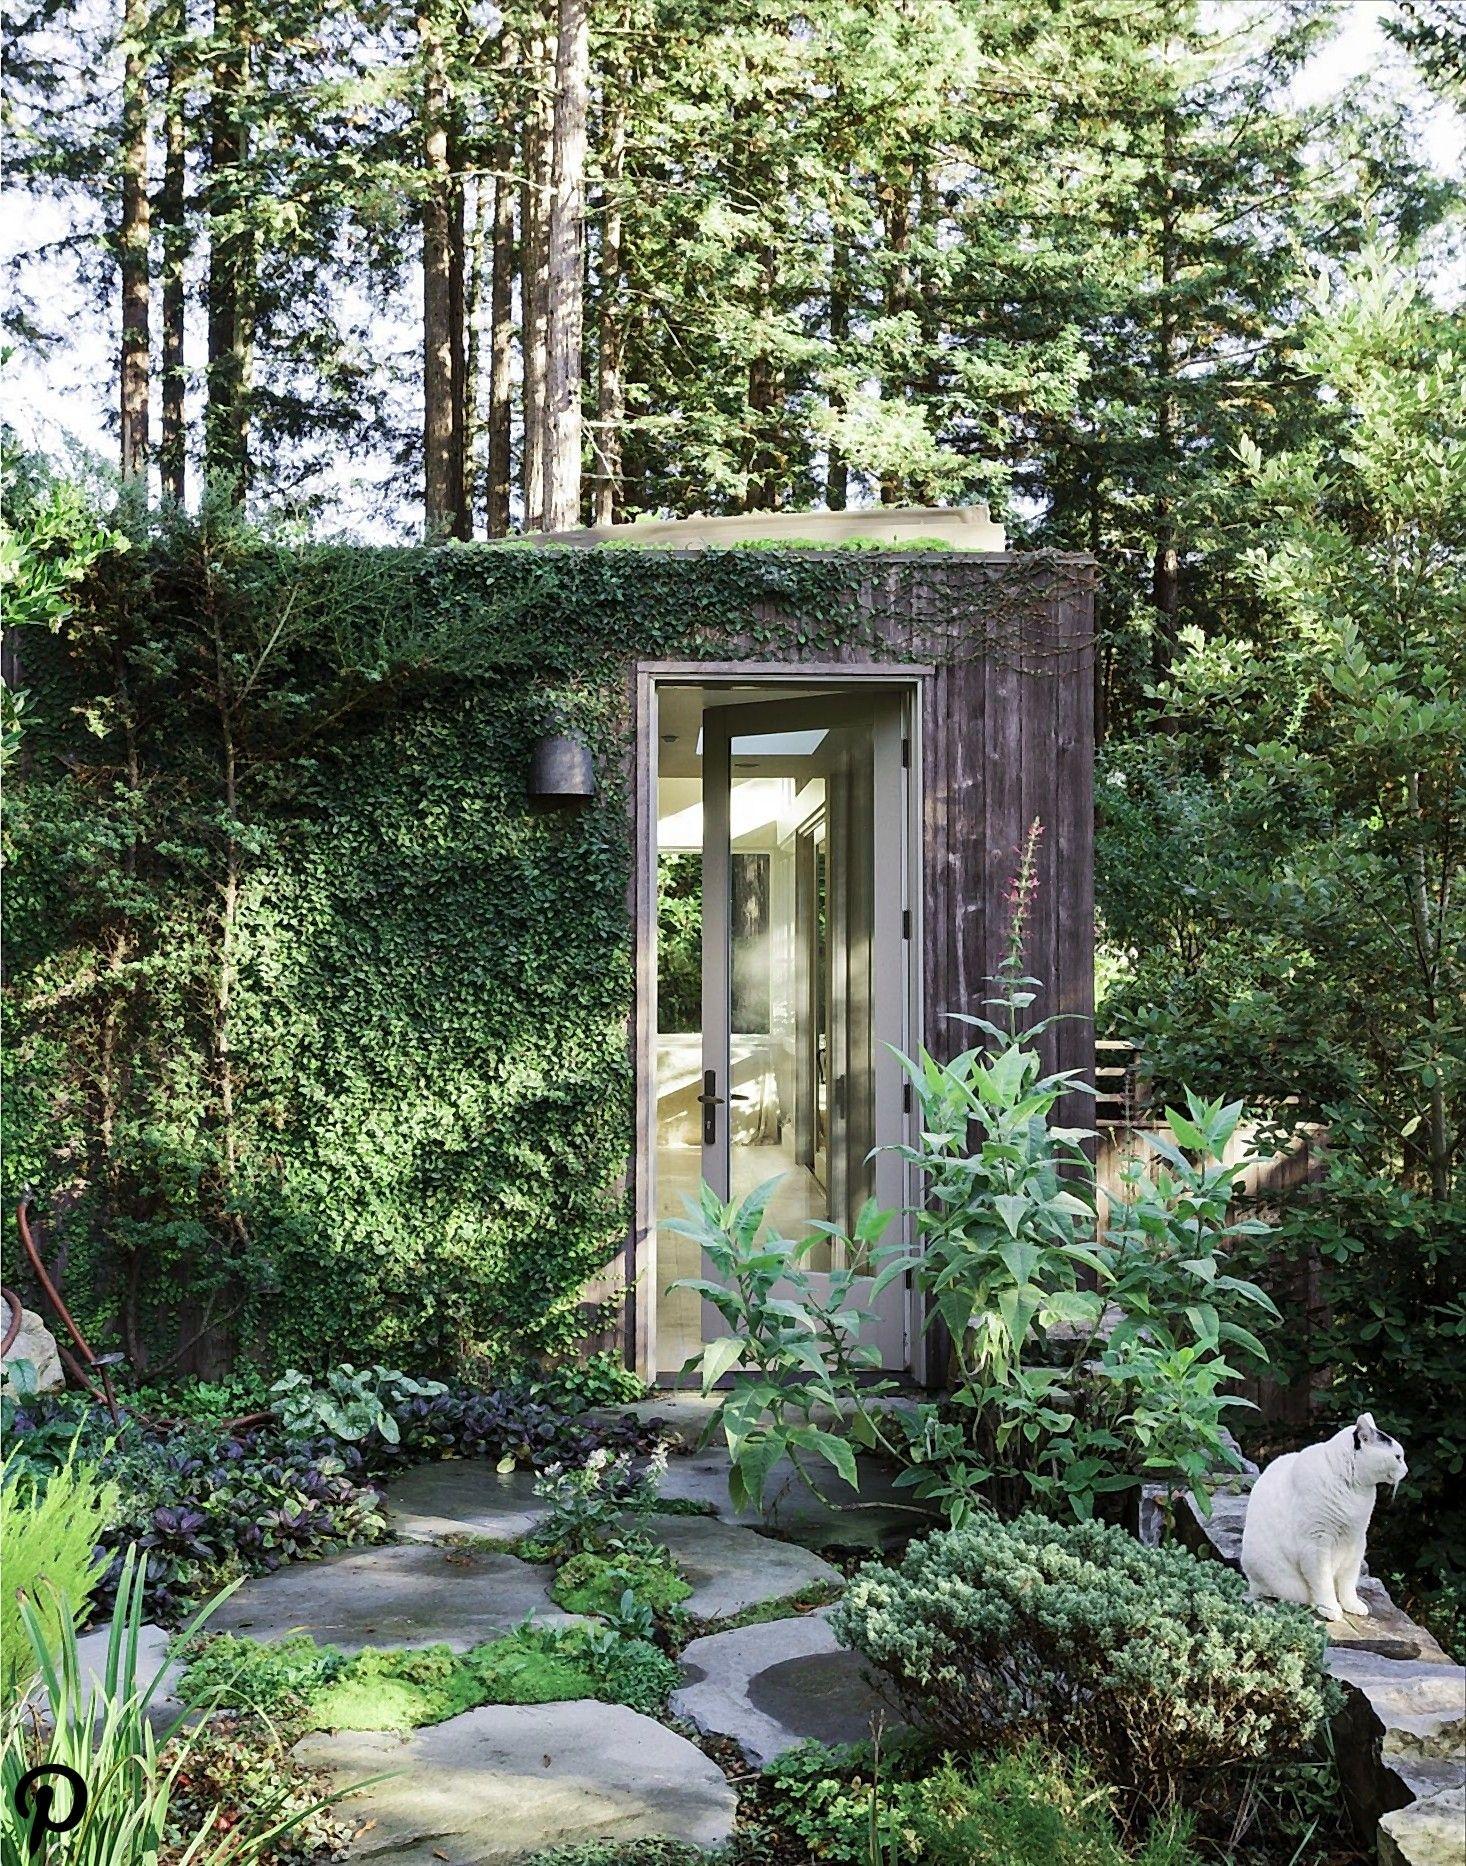 Fig Garden Yoga : garden, Gardening, Creeping, Backyard, Studio